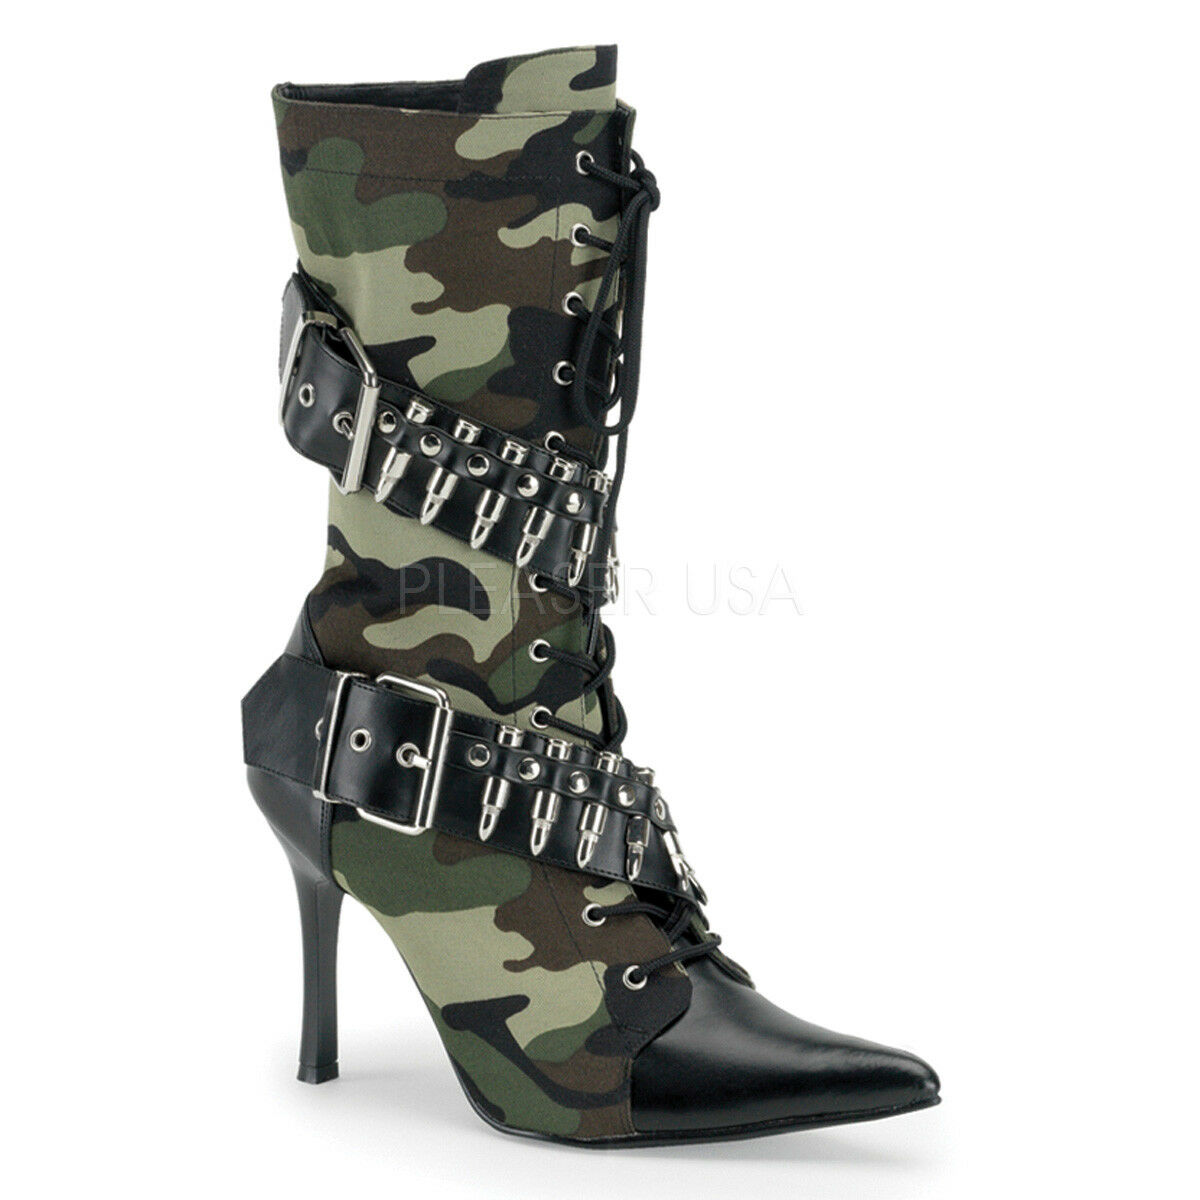 Pleaser Funtasma MILITANT - 128 Camouflage Militaire Cosplay Bottes Mi-Mollet